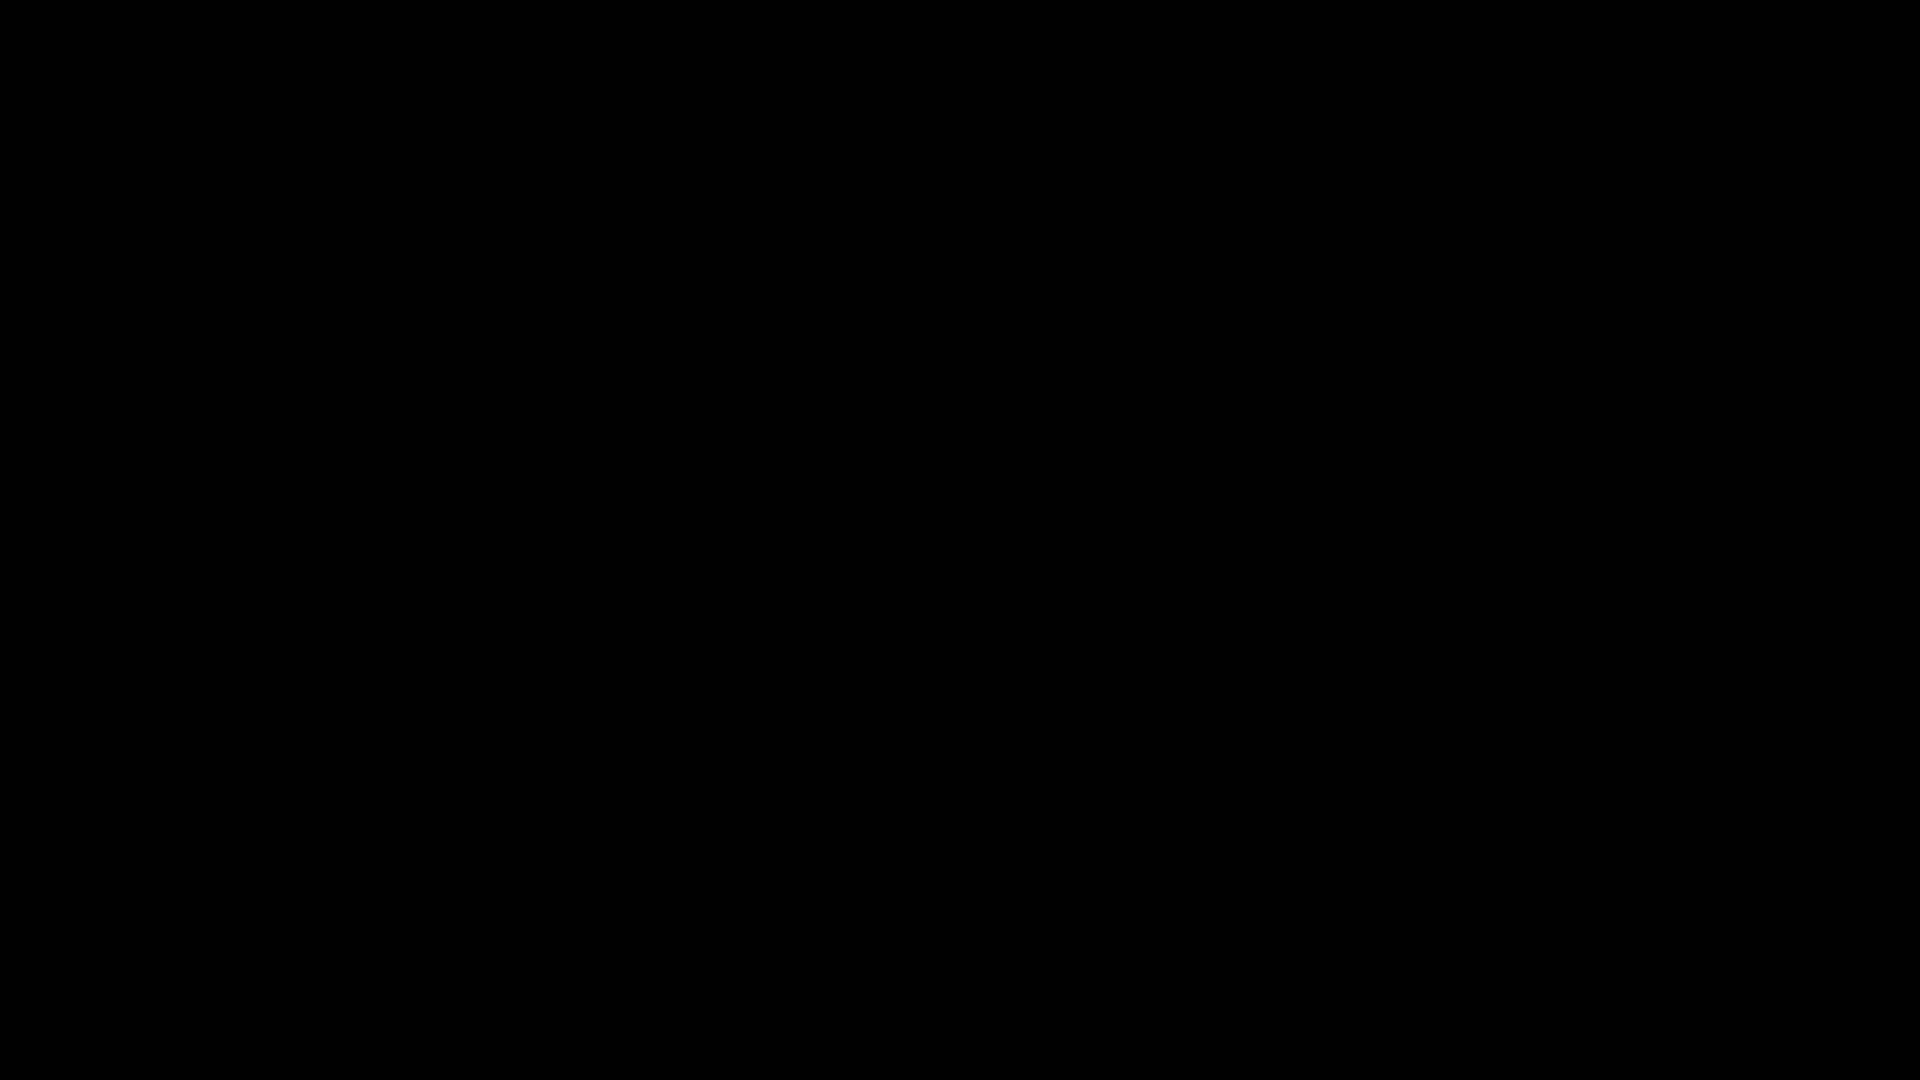 HD transparent picture